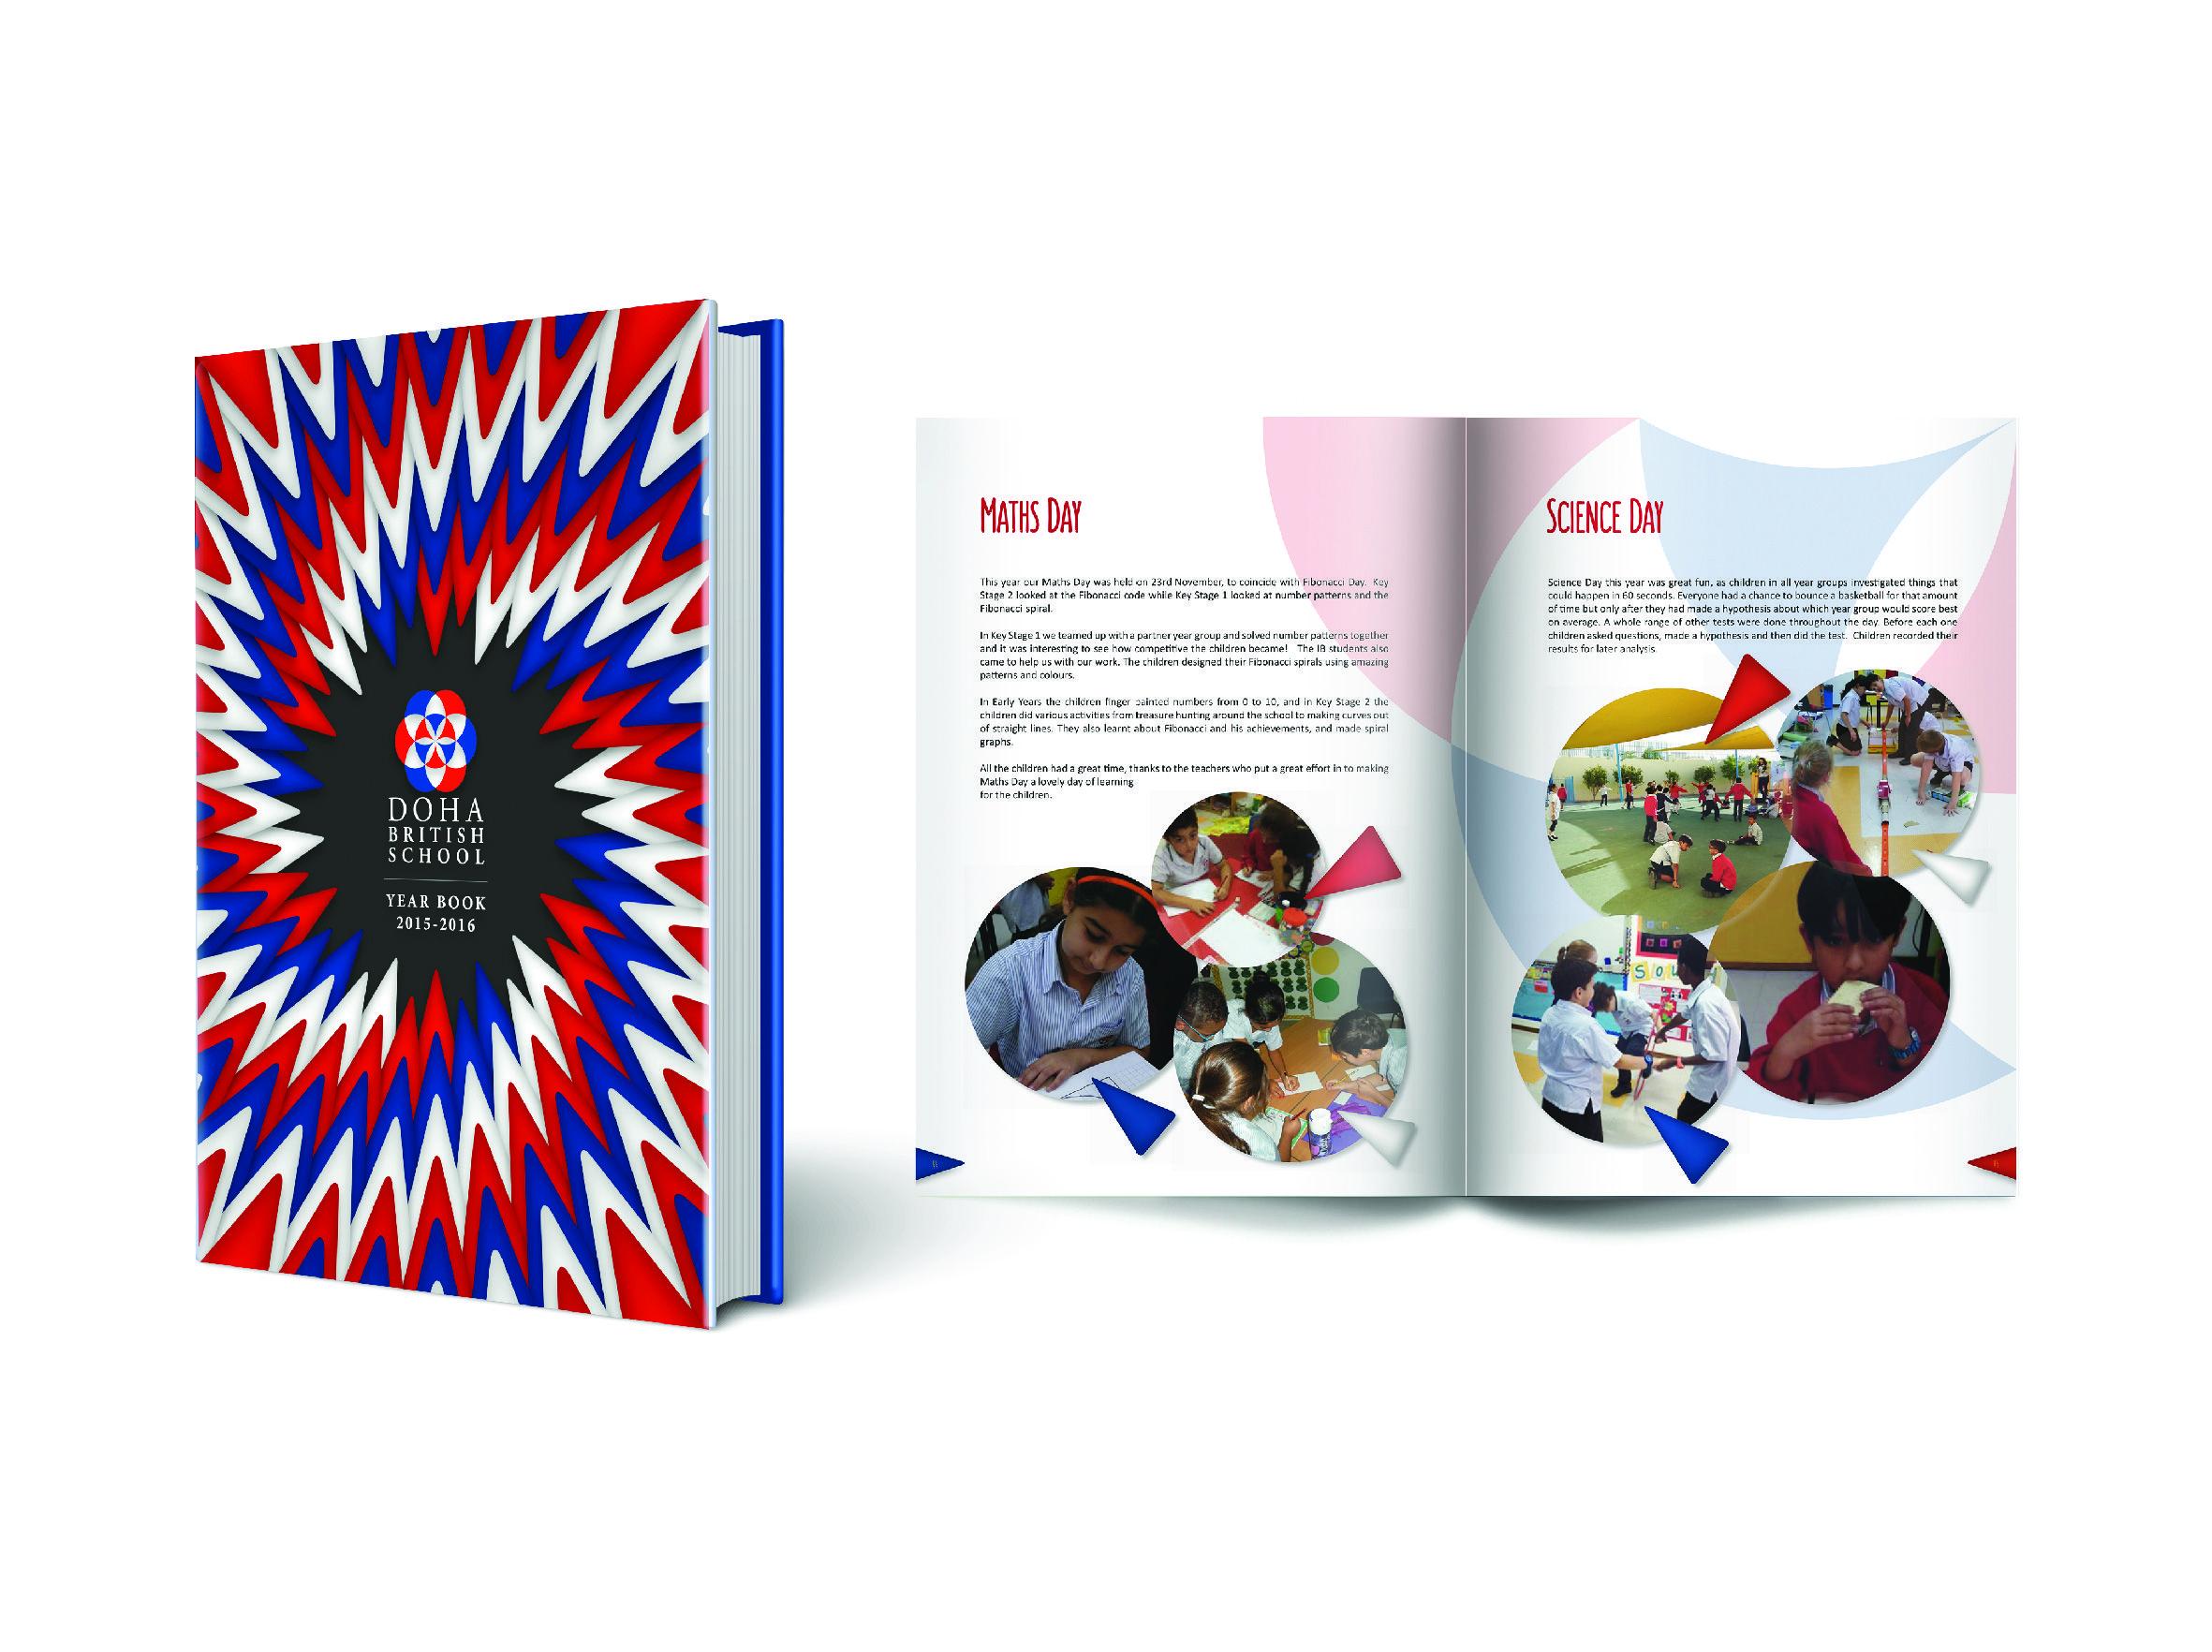 Doha british school ain khaled year book design and layout design doha british school ain khaled year book design and layout design layout concept fandeluxe Gallery